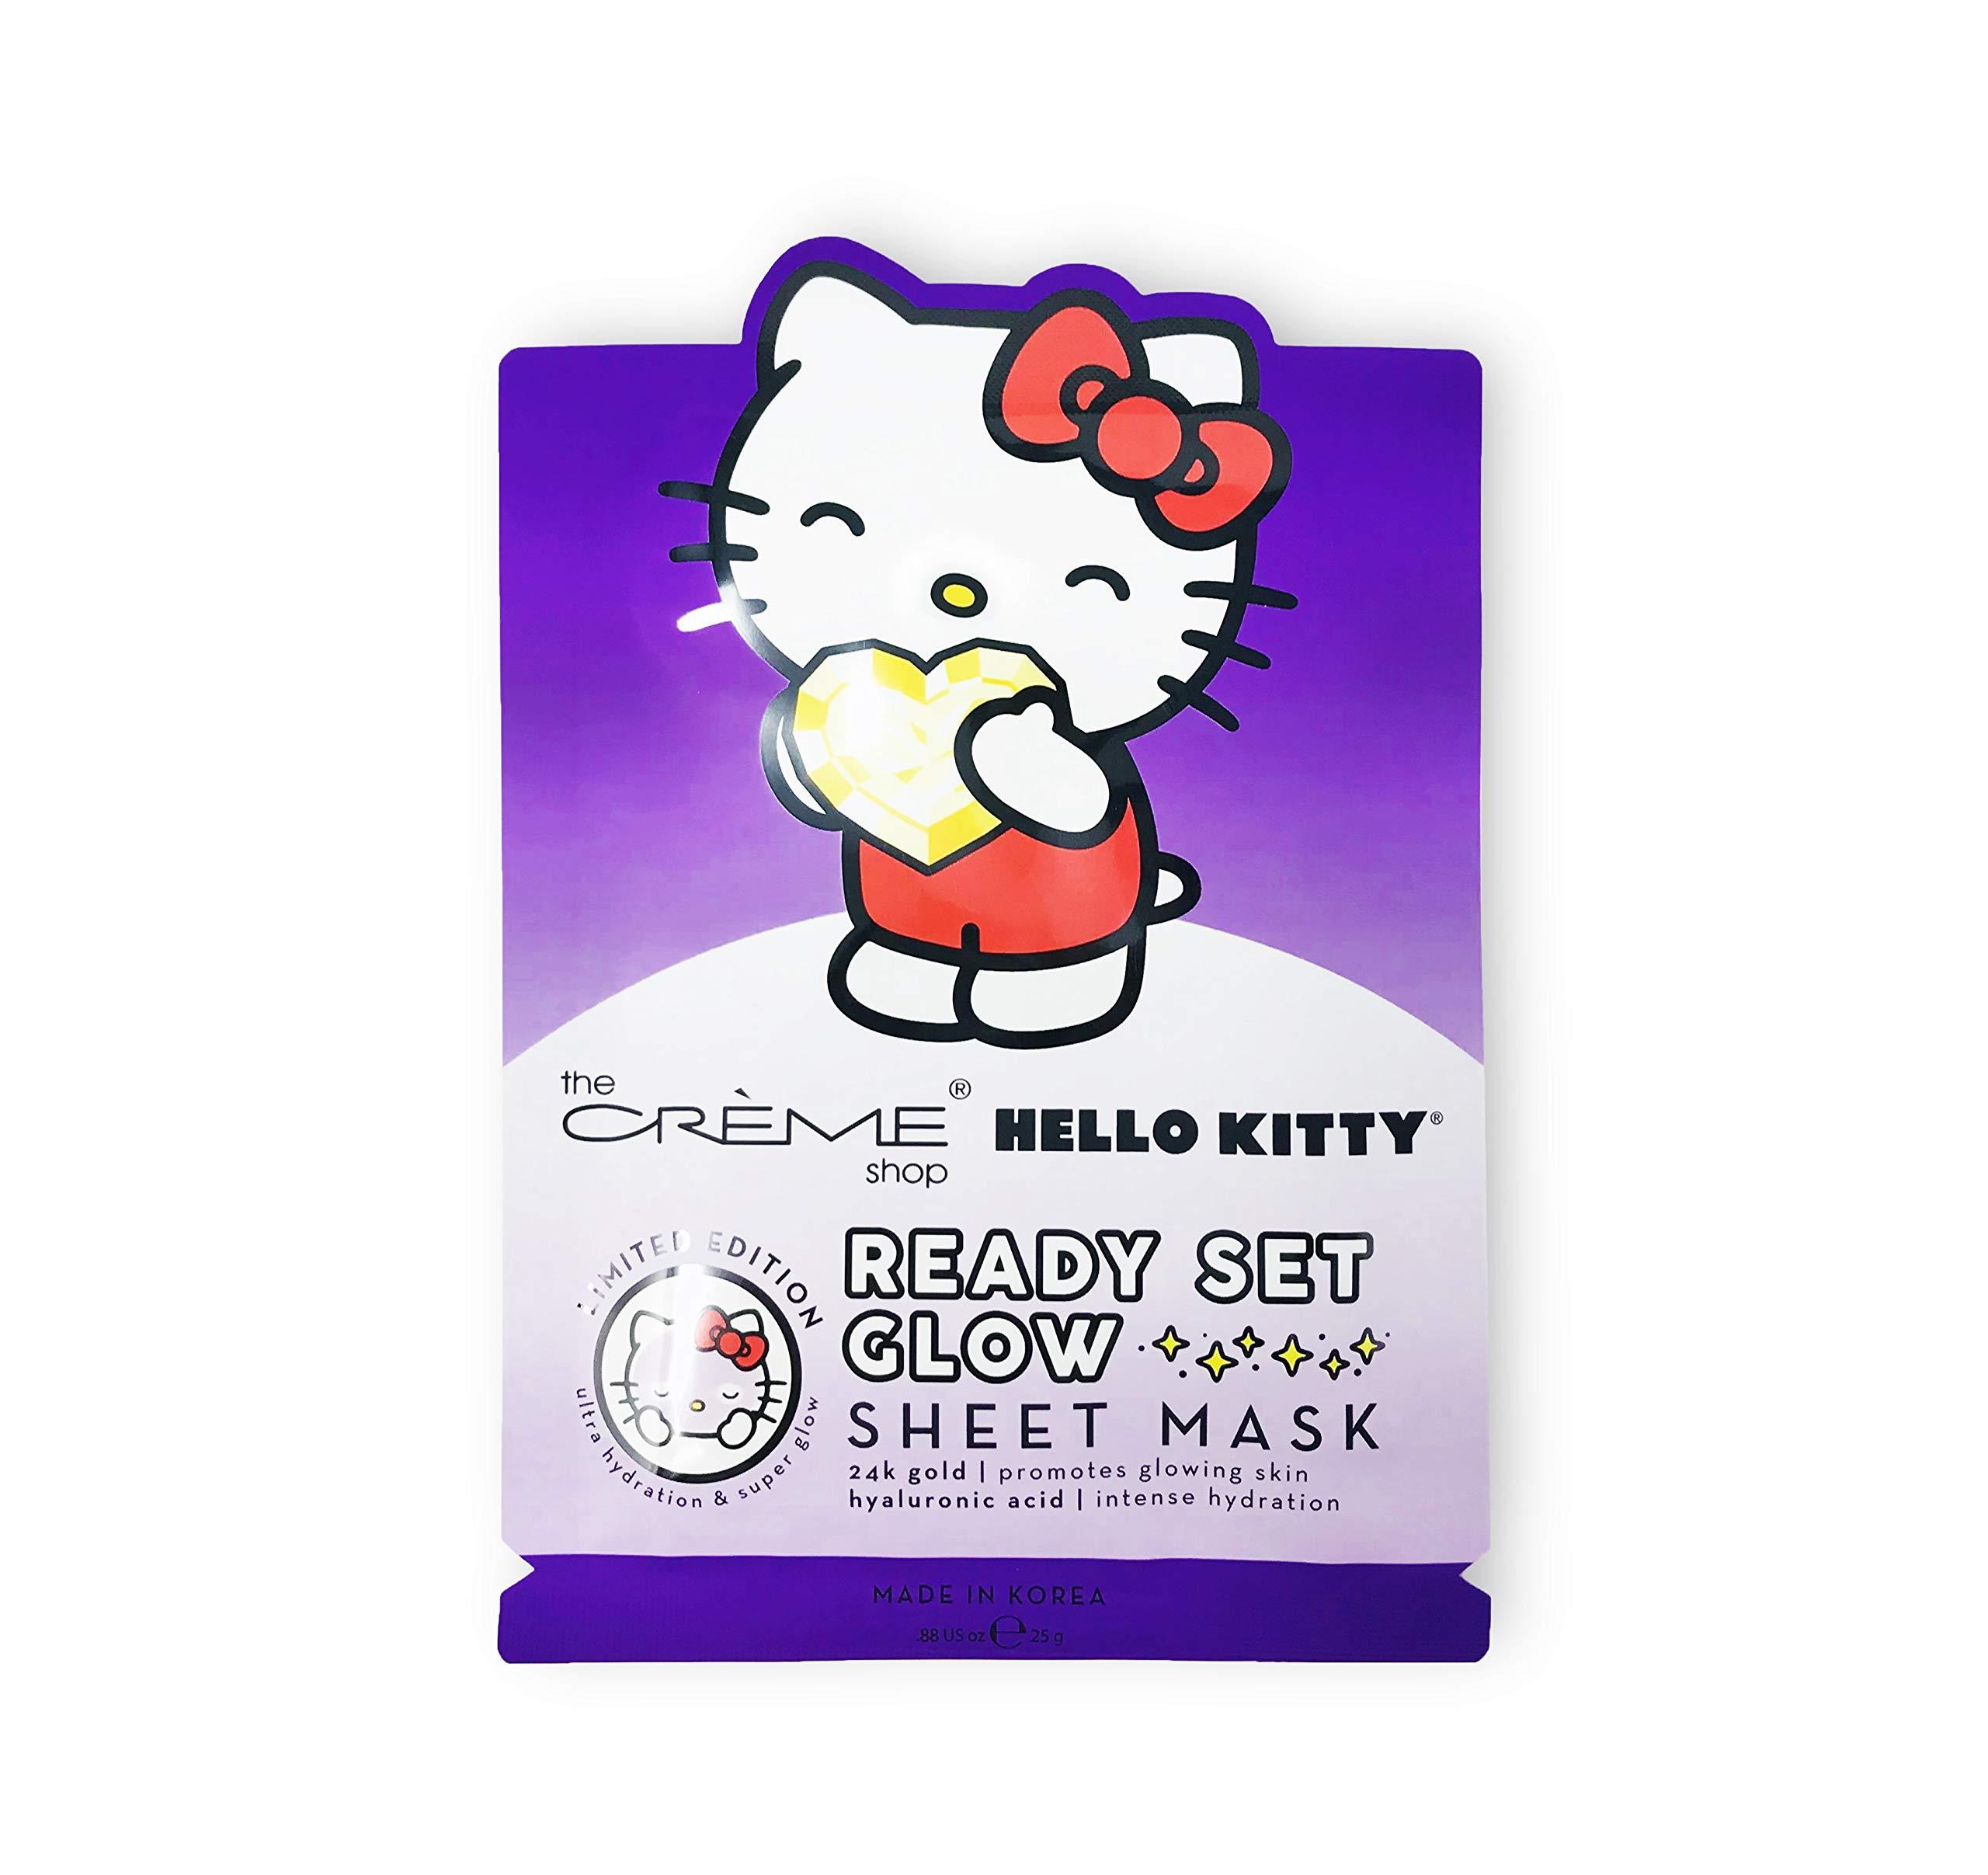 9c207a4d7 Amazon.com : The Crème Shop x Sanrio Sheet Mask (Hello Kitty Ready Set  Glow) : Beauty